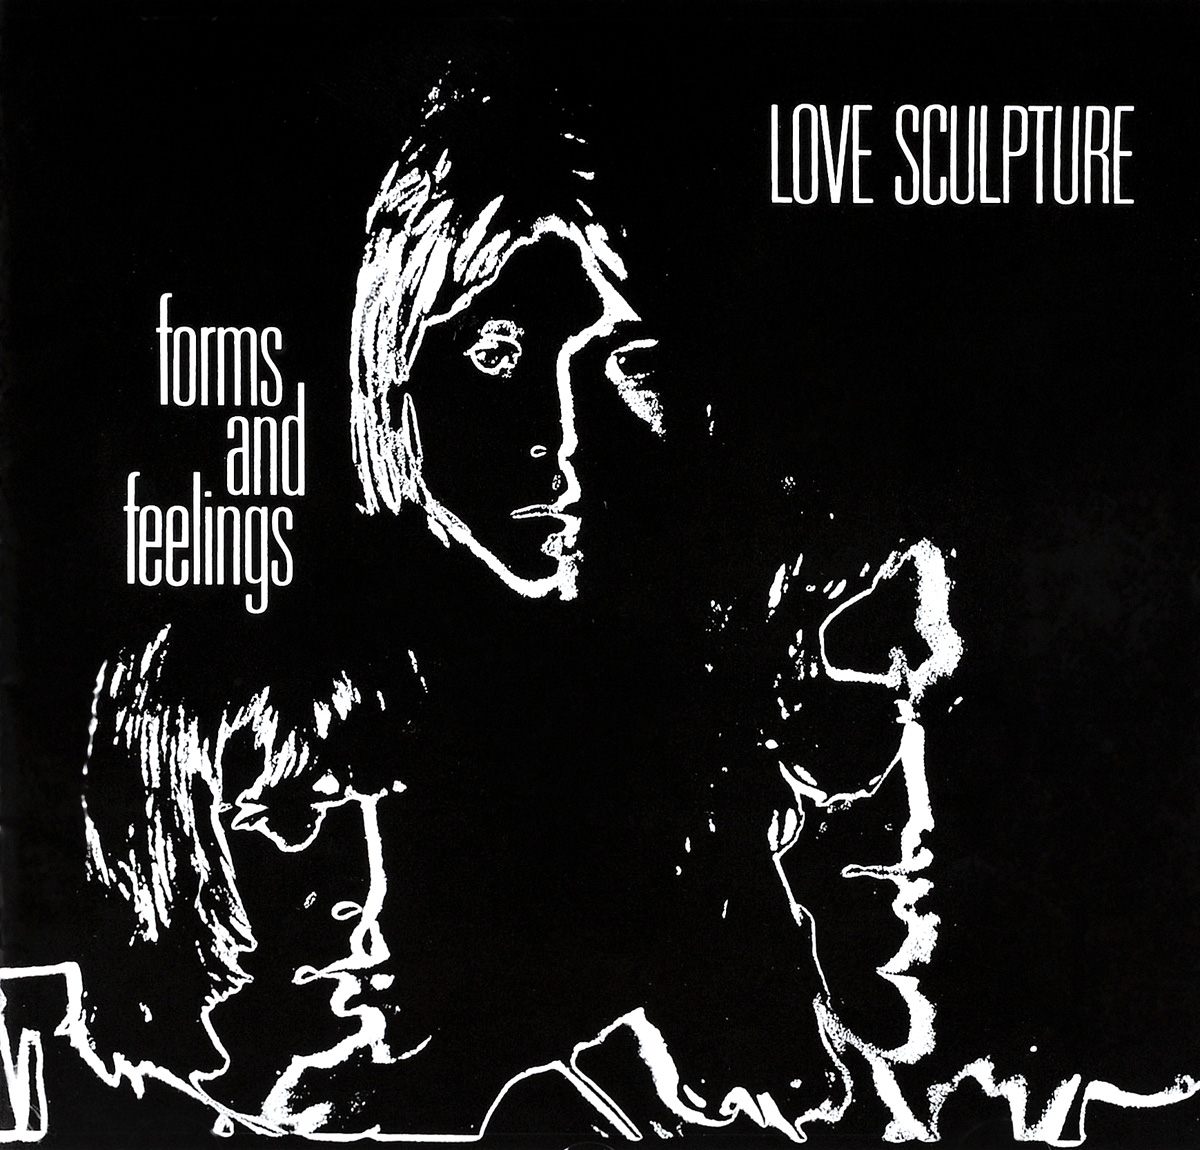 Love Sculpture Love Sculpture. Forms And Feelings sculpture david